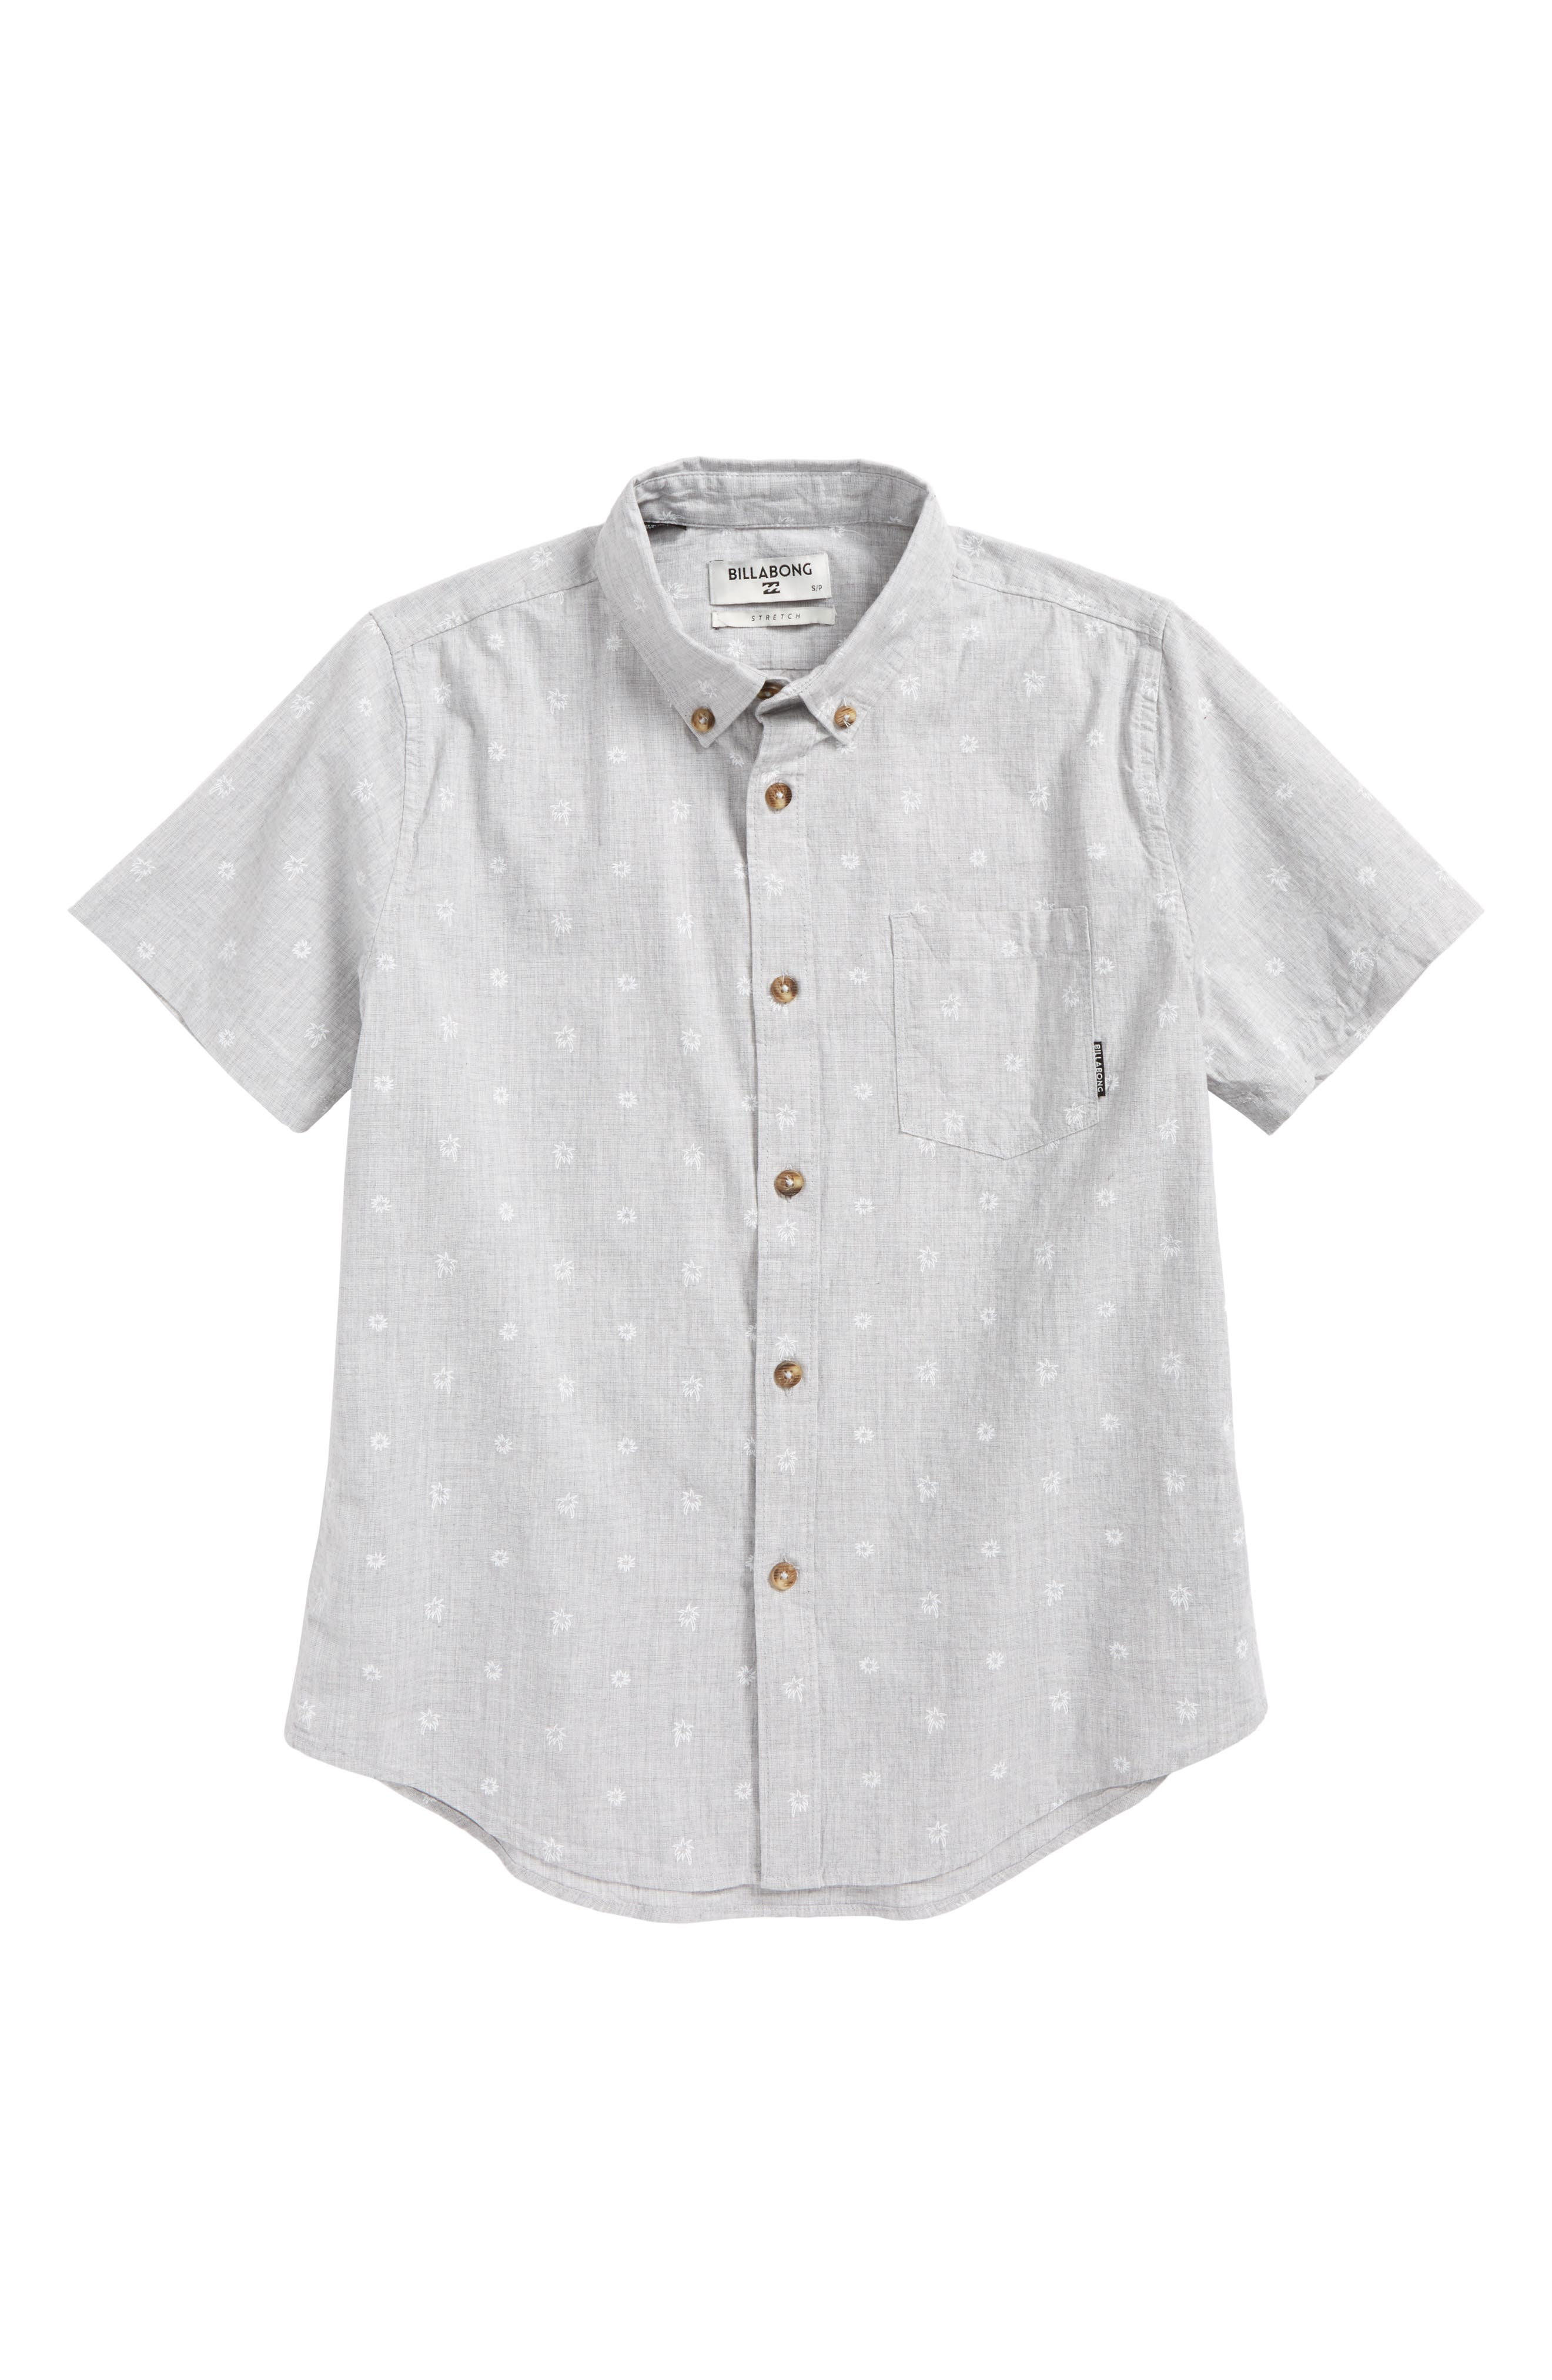 Sundays Mini Short Sleeve Woven Shirt,                             Main thumbnail 1, color,                             Light Grey Heather